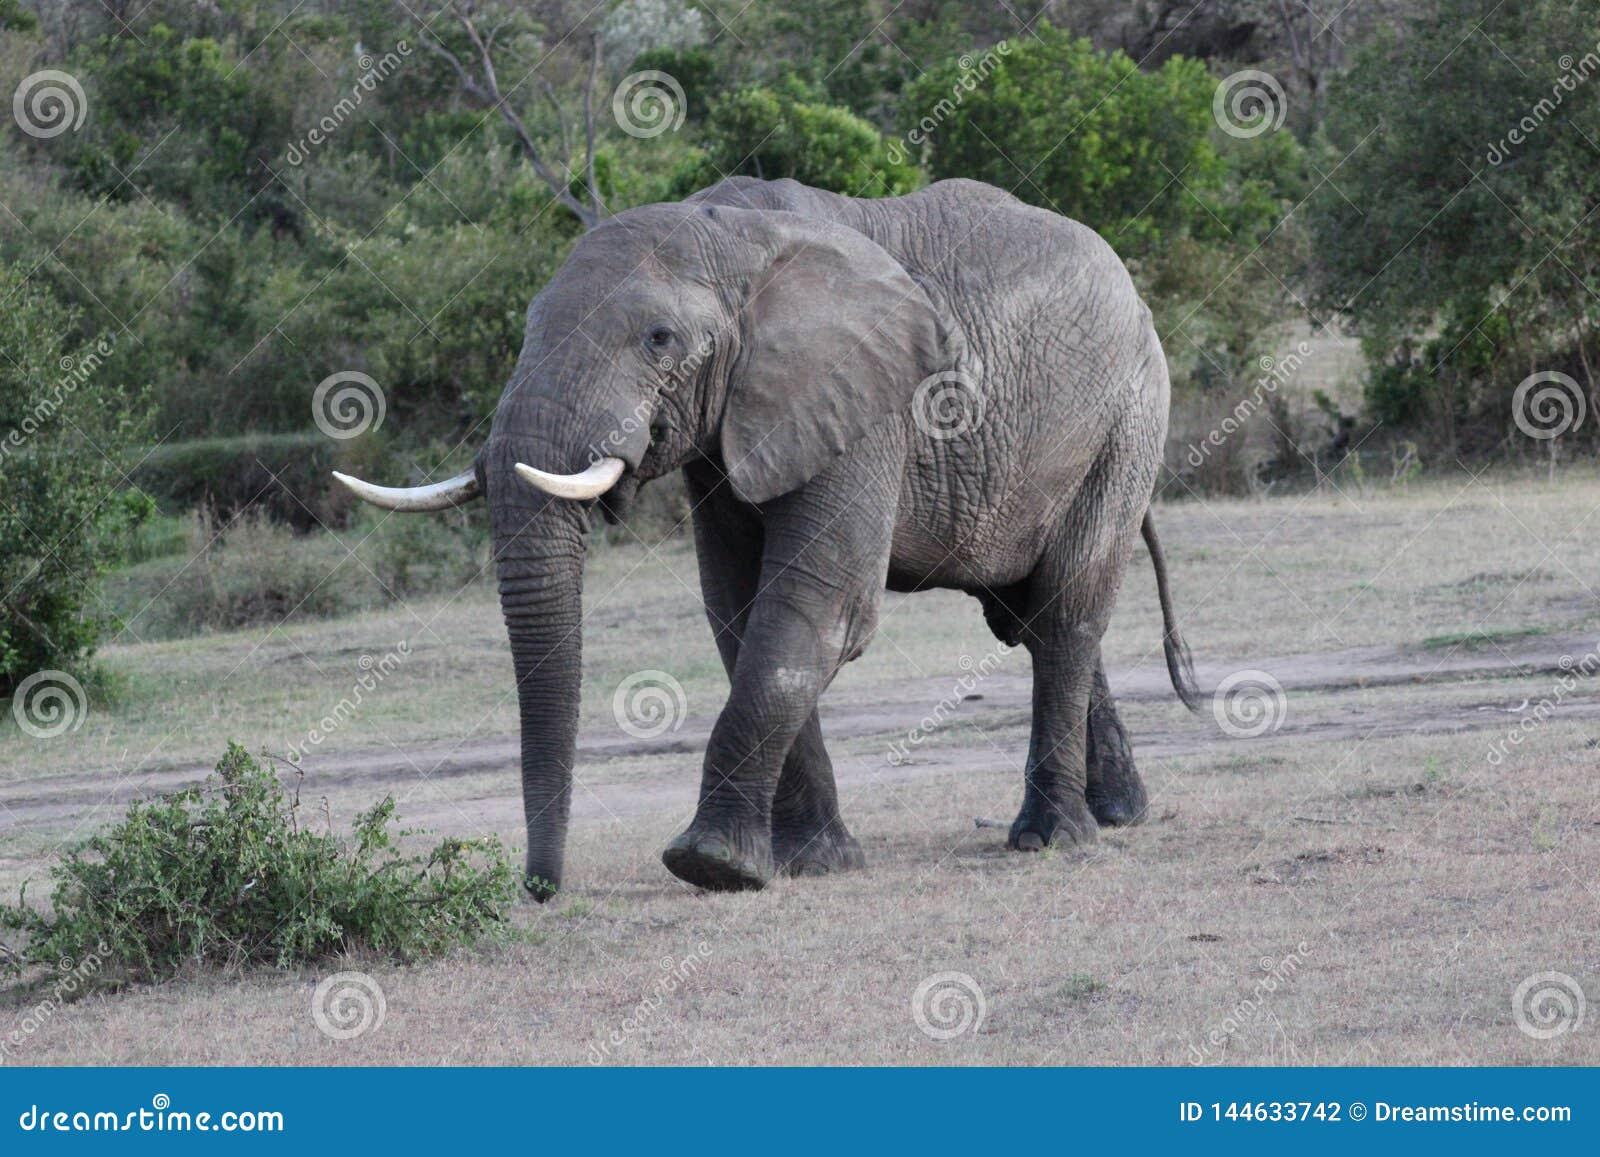 Elephant walking on grassfields in the savanna